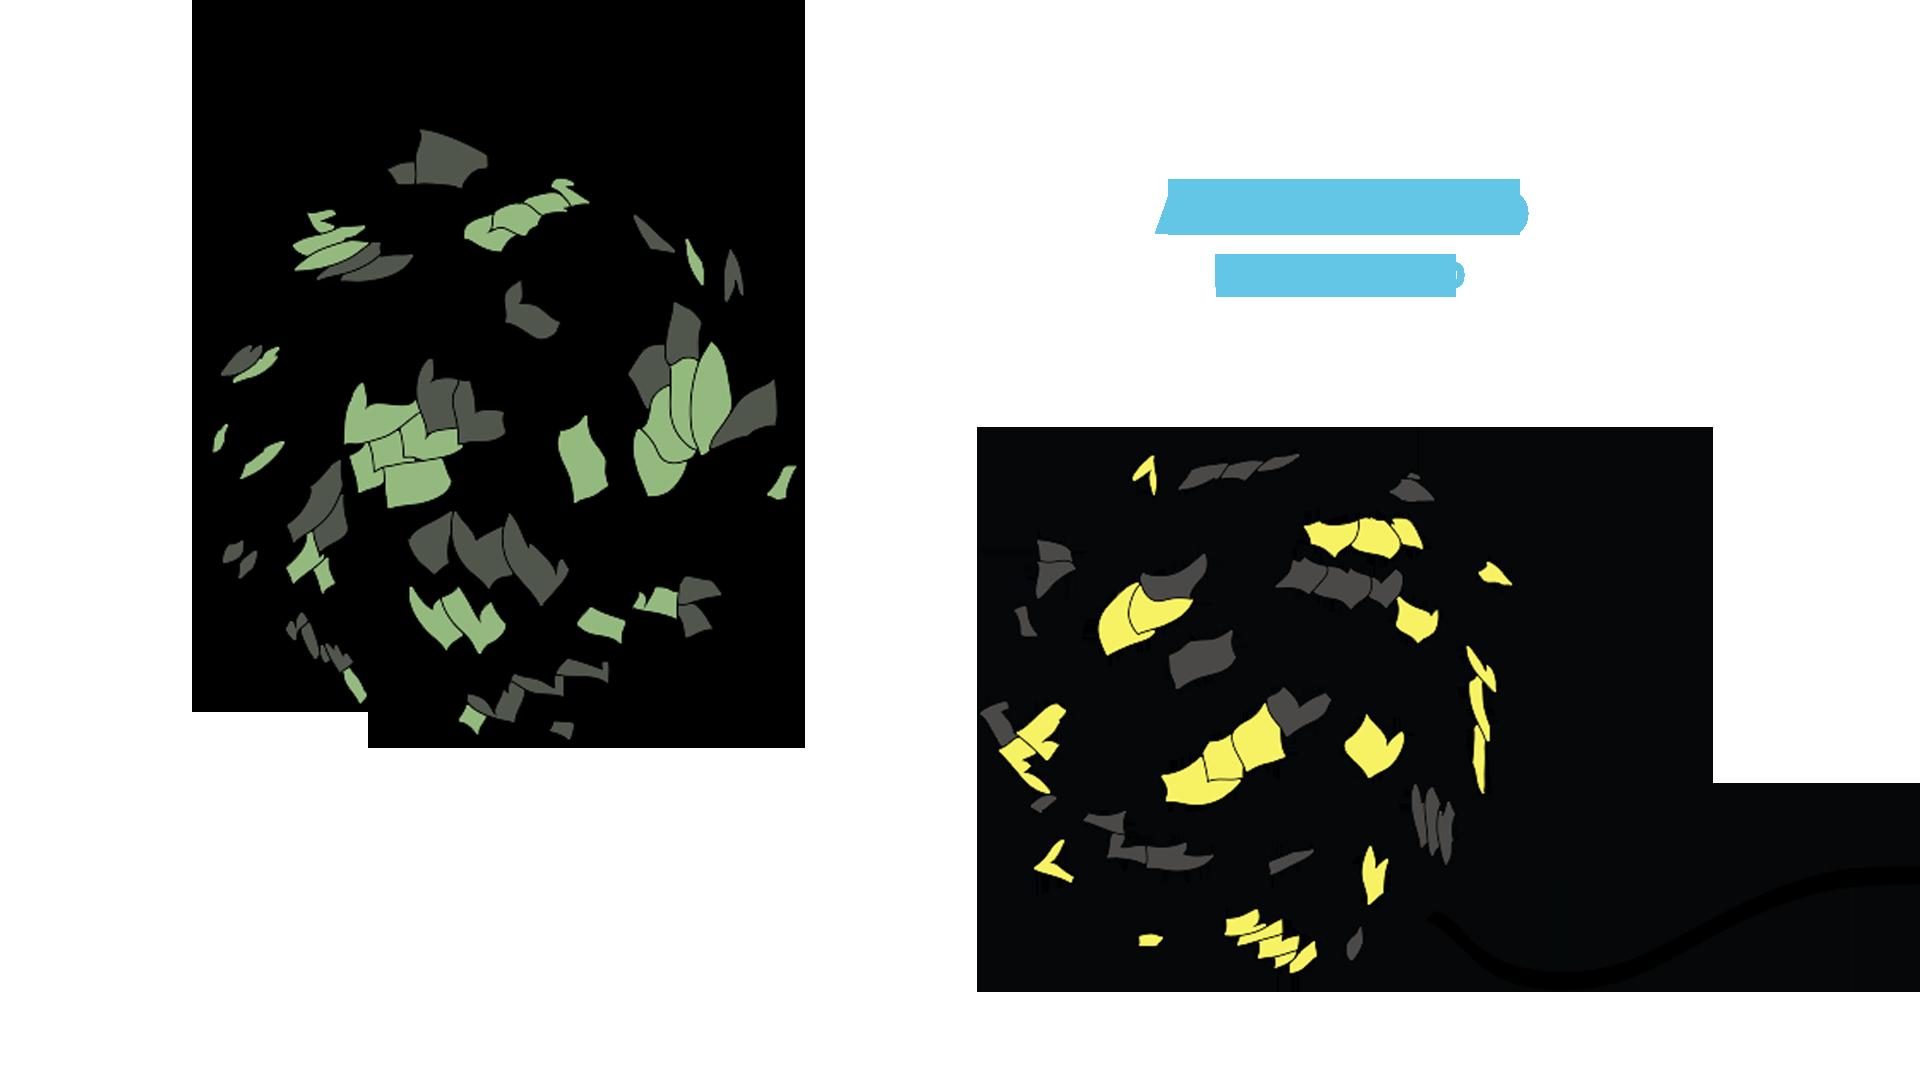 armadillo_lamp